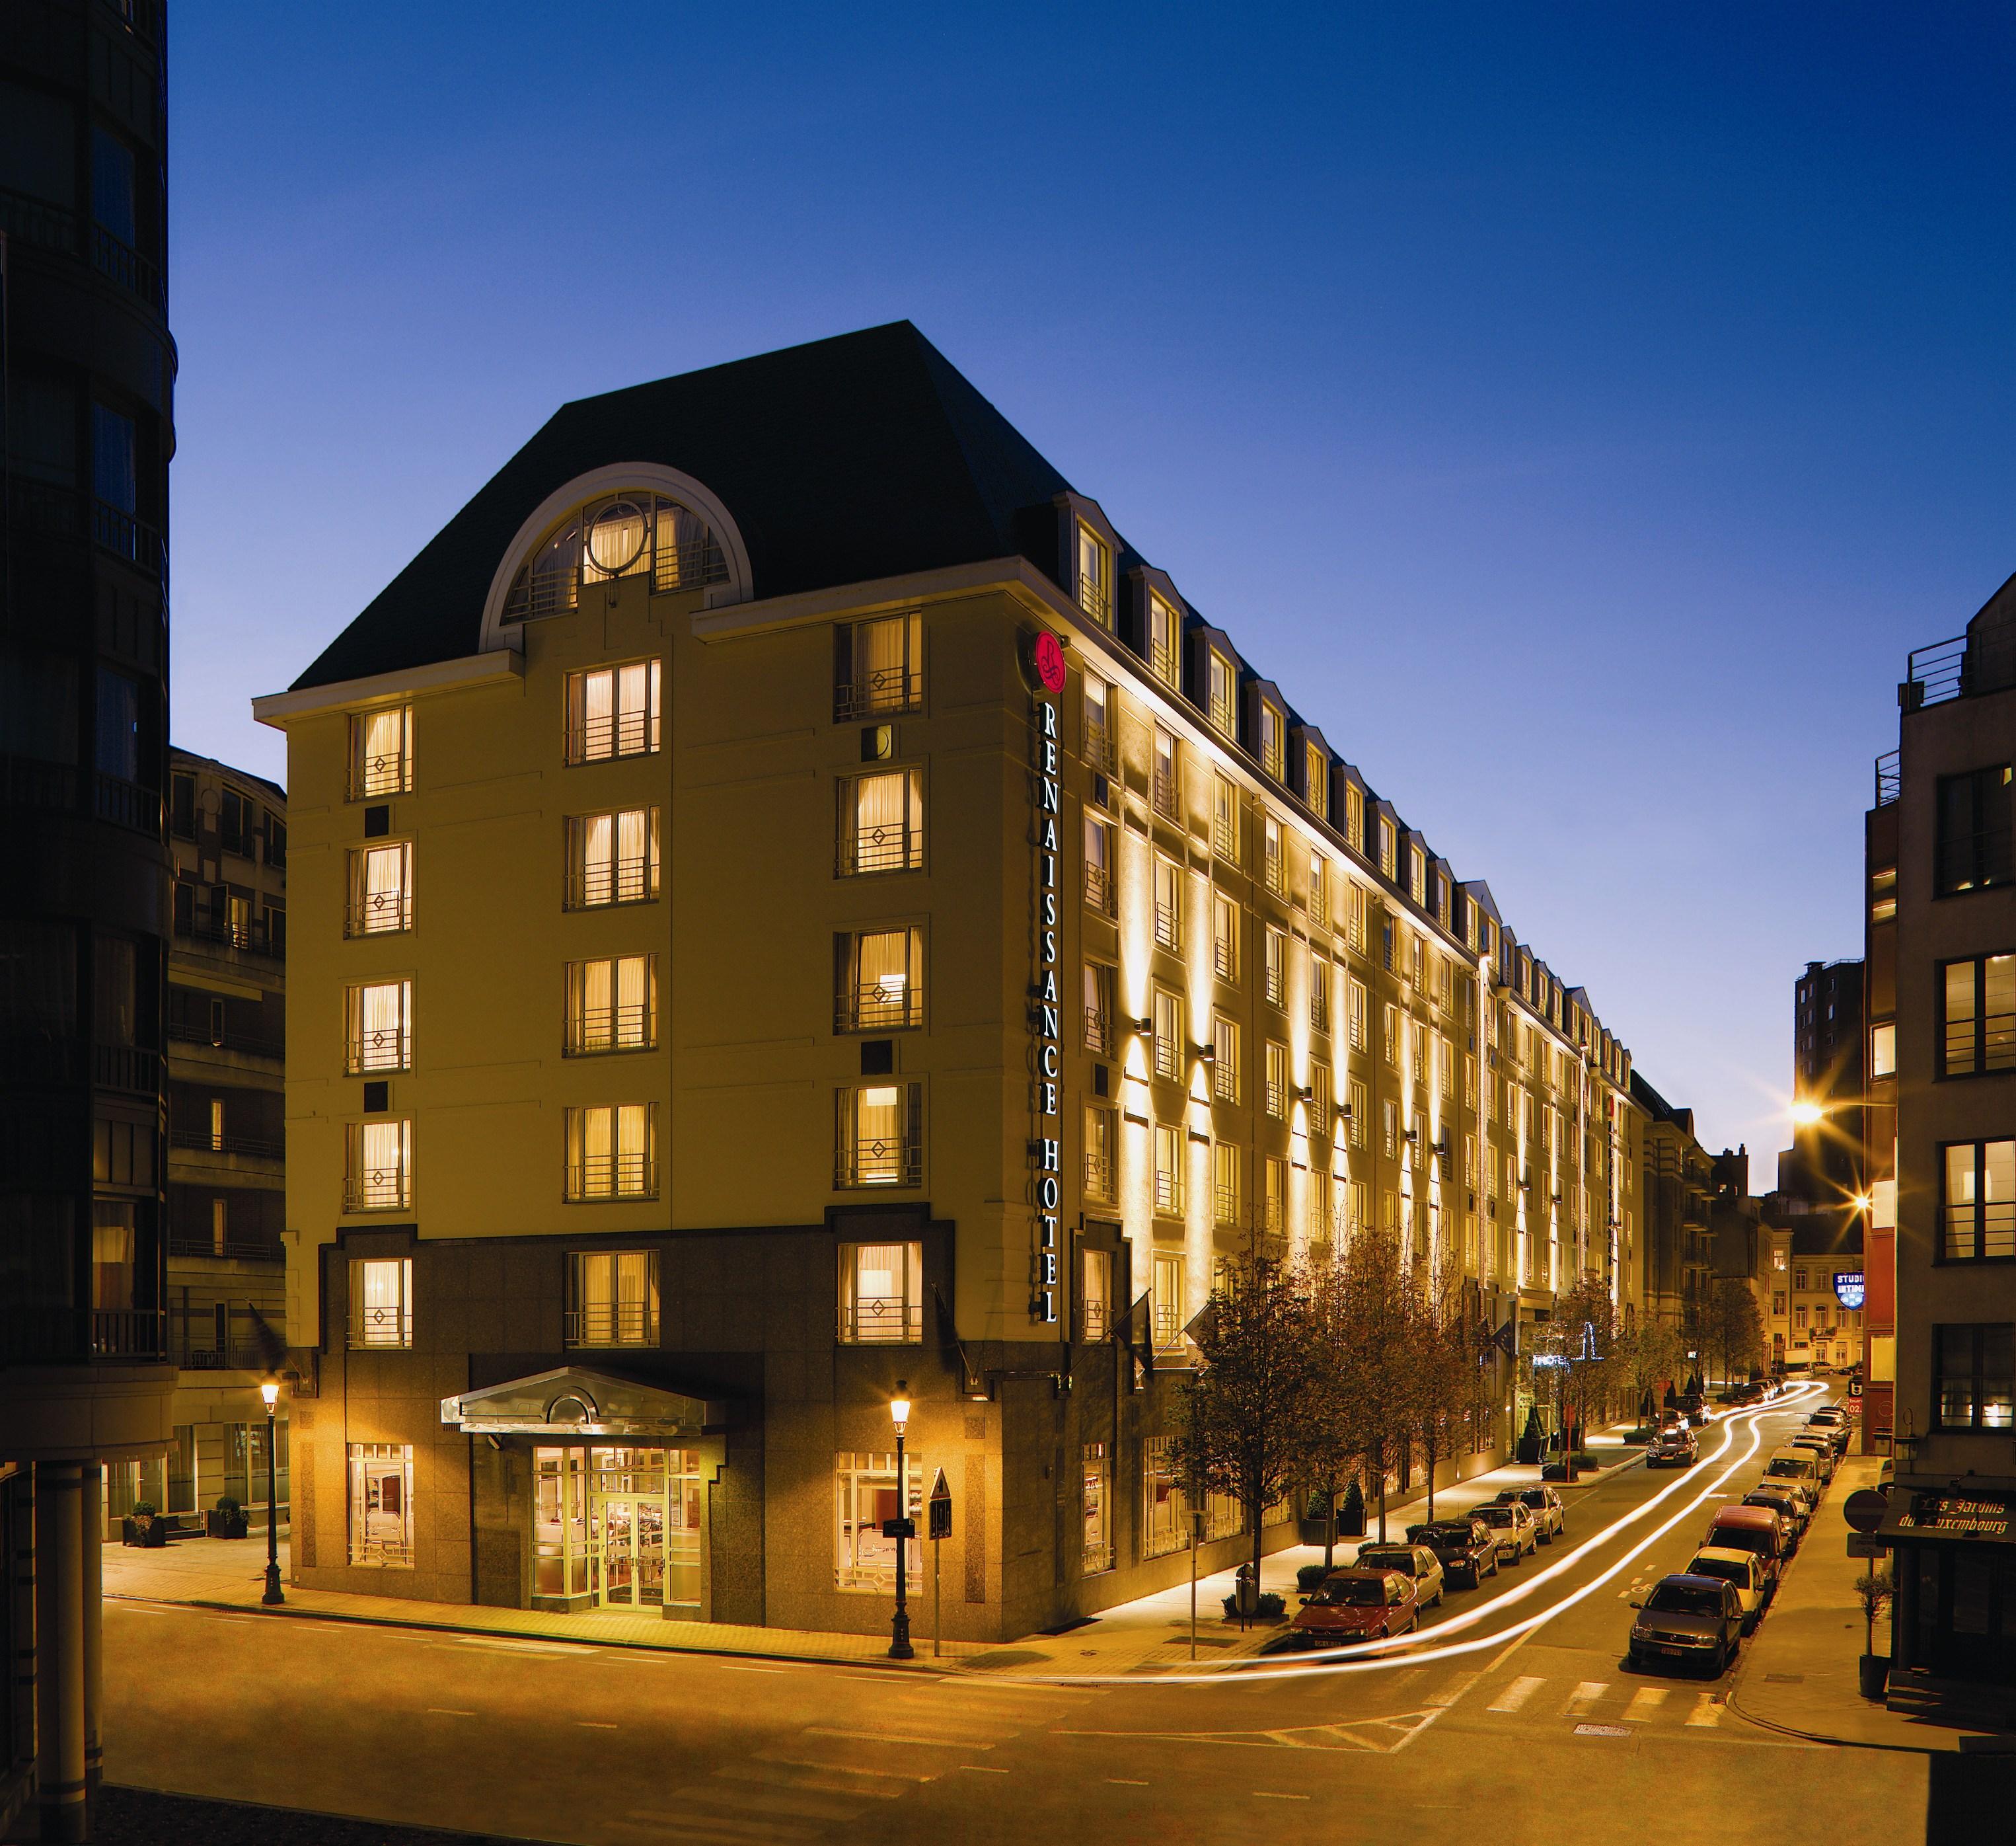 renaissance_brussels_hotel.jpg